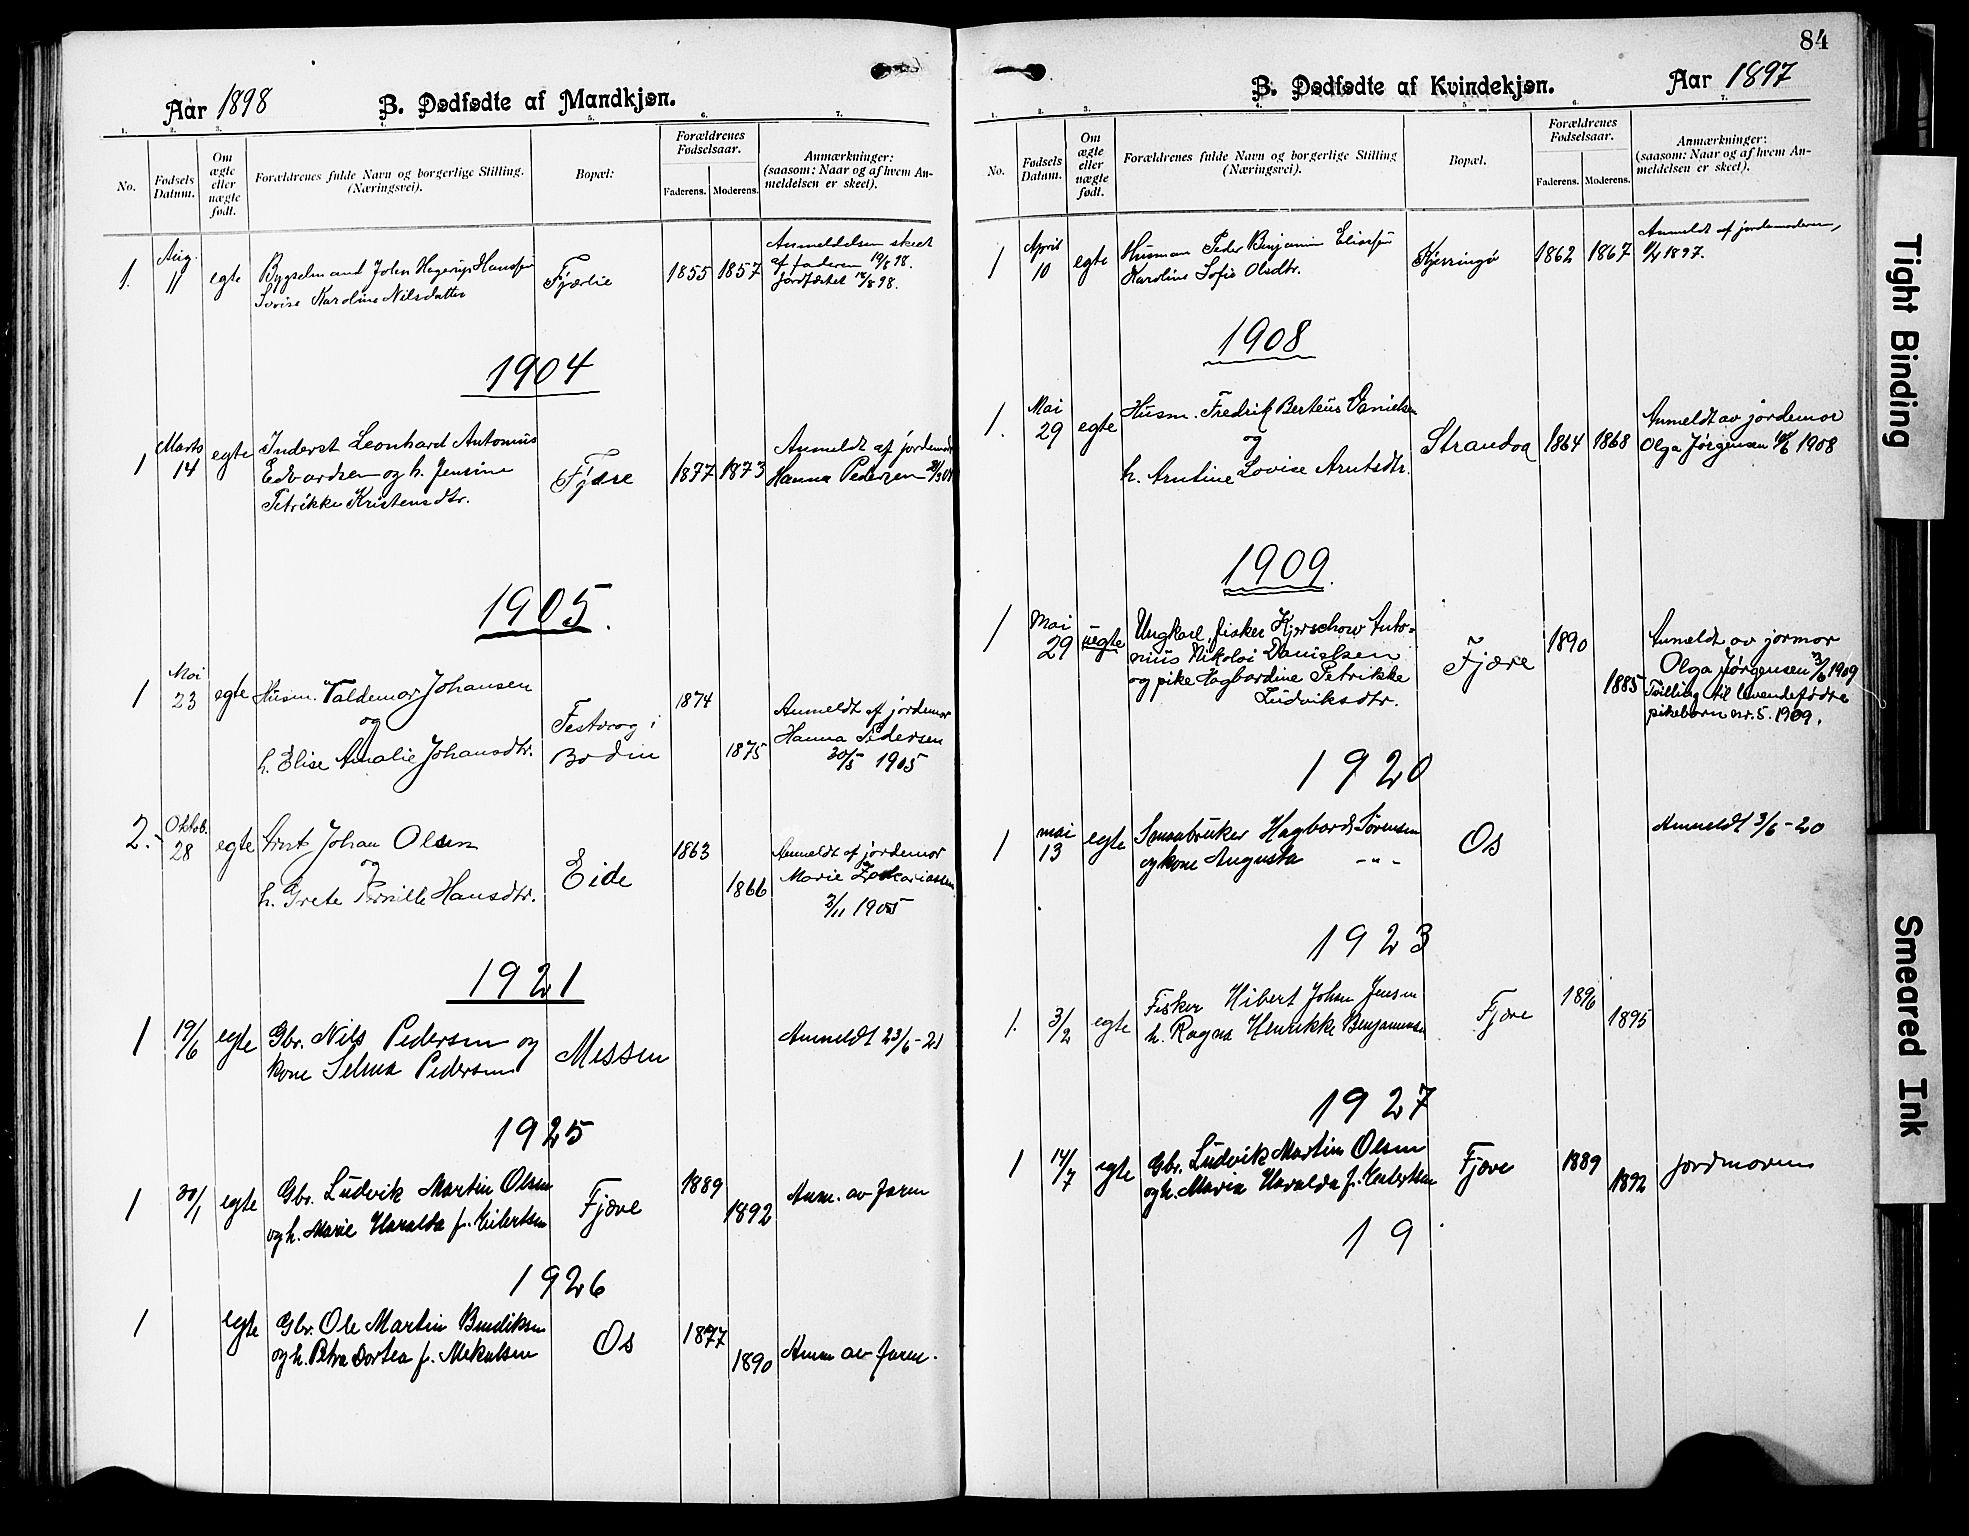 SAT, Ministerialprotokoller, klokkerbøker og fødselsregistre - Nordland, 803/L0077: Klokkerbok nr. 803C04, 1897-1930, s. 84